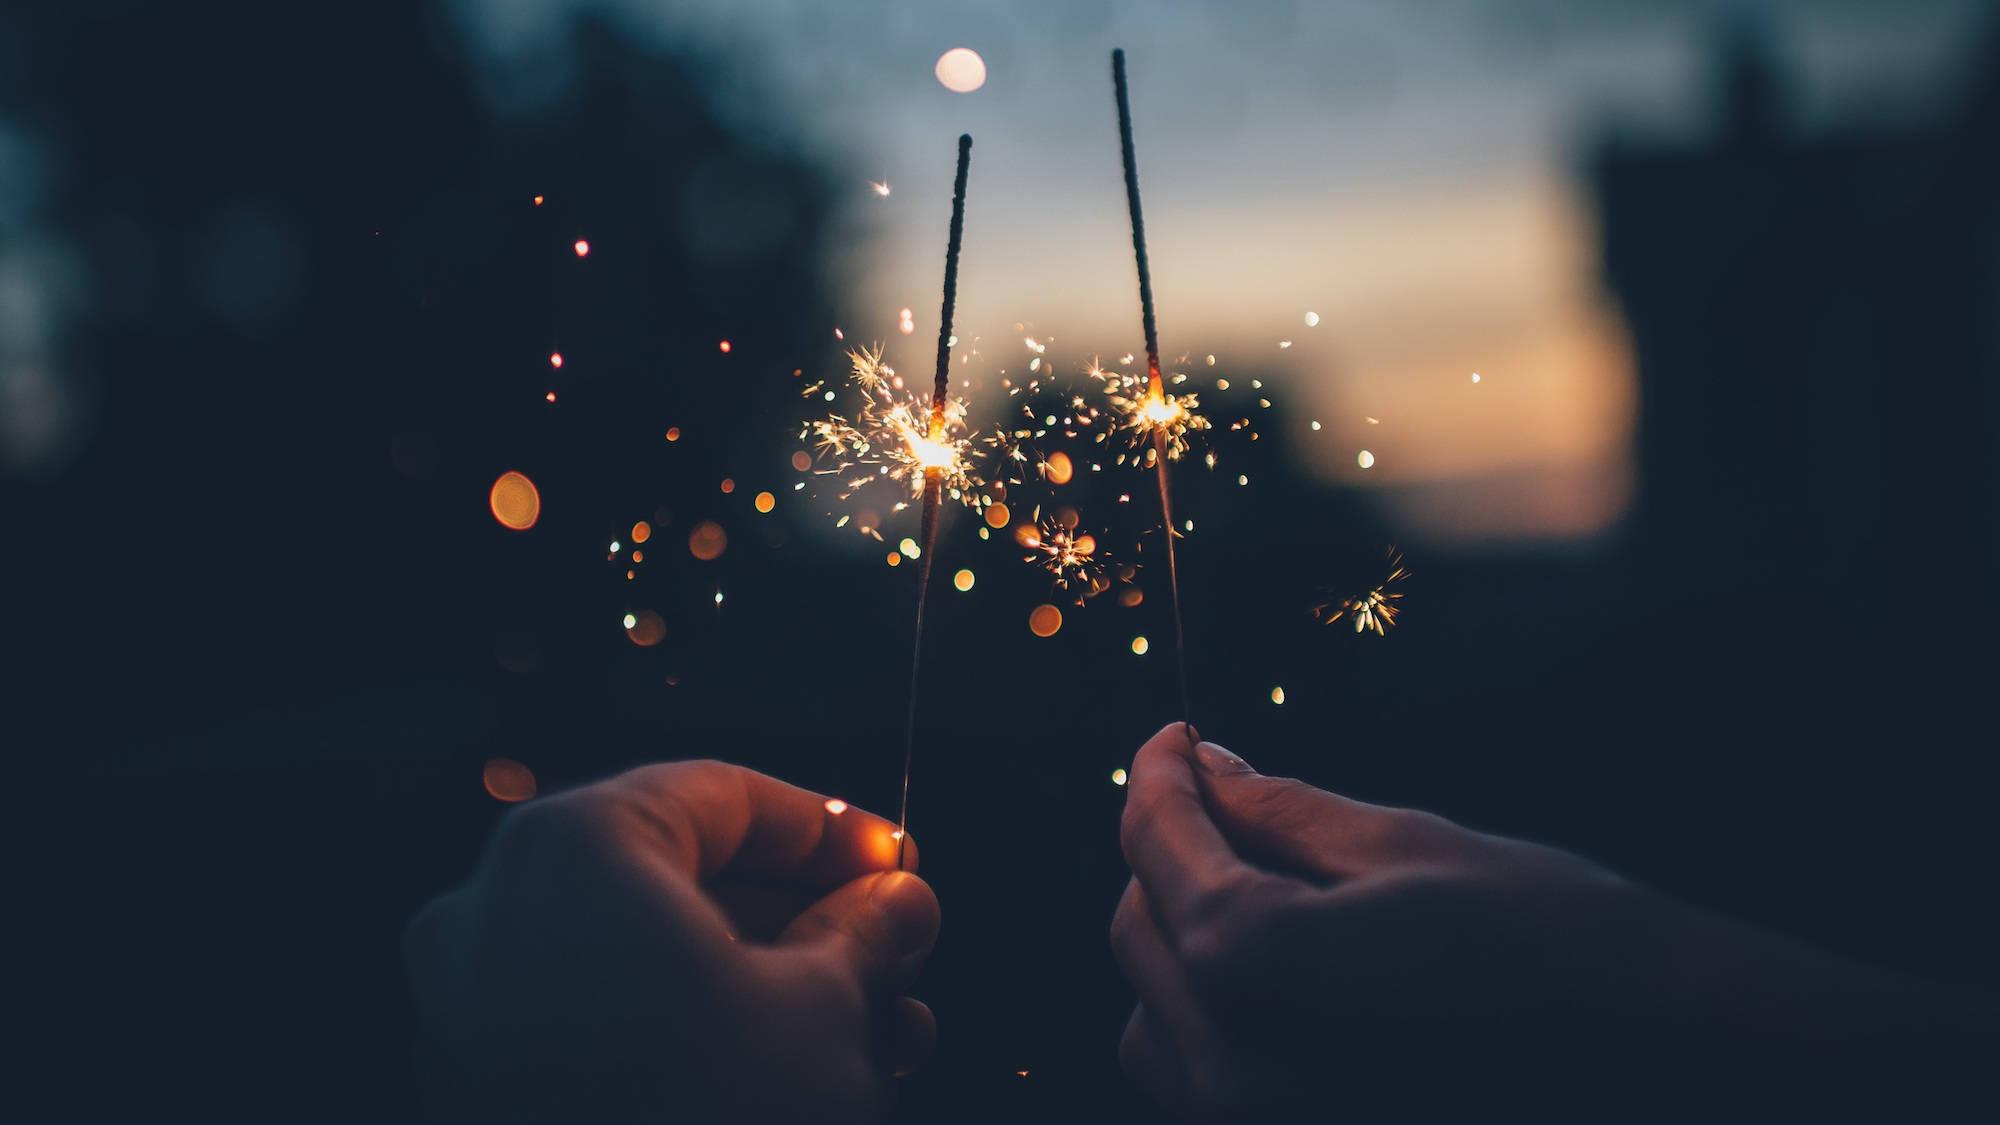 Firework displays, bonfire night in Leeds